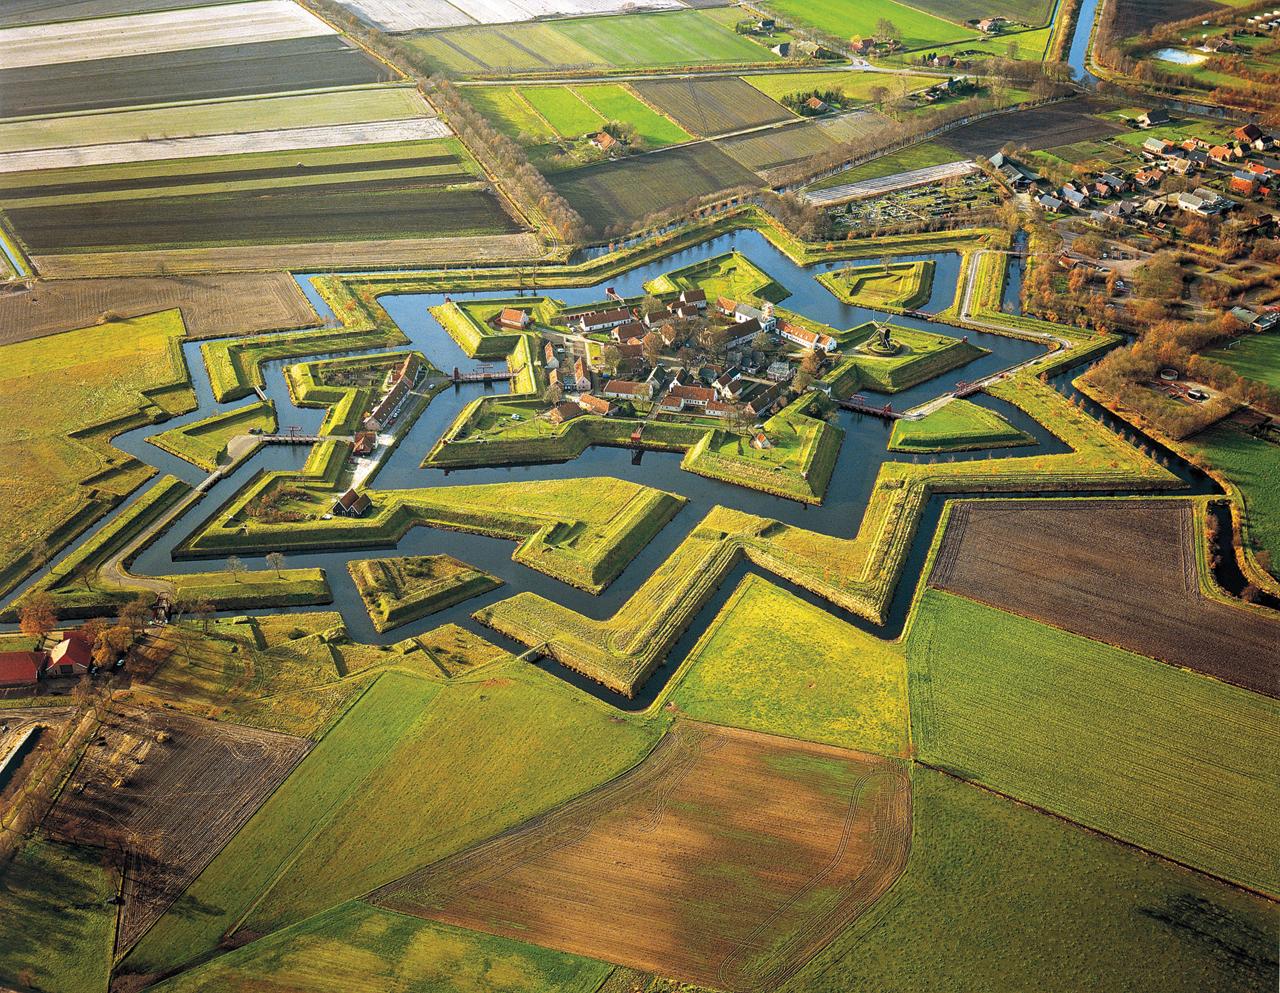 Bourtange (Paesi Bassi)